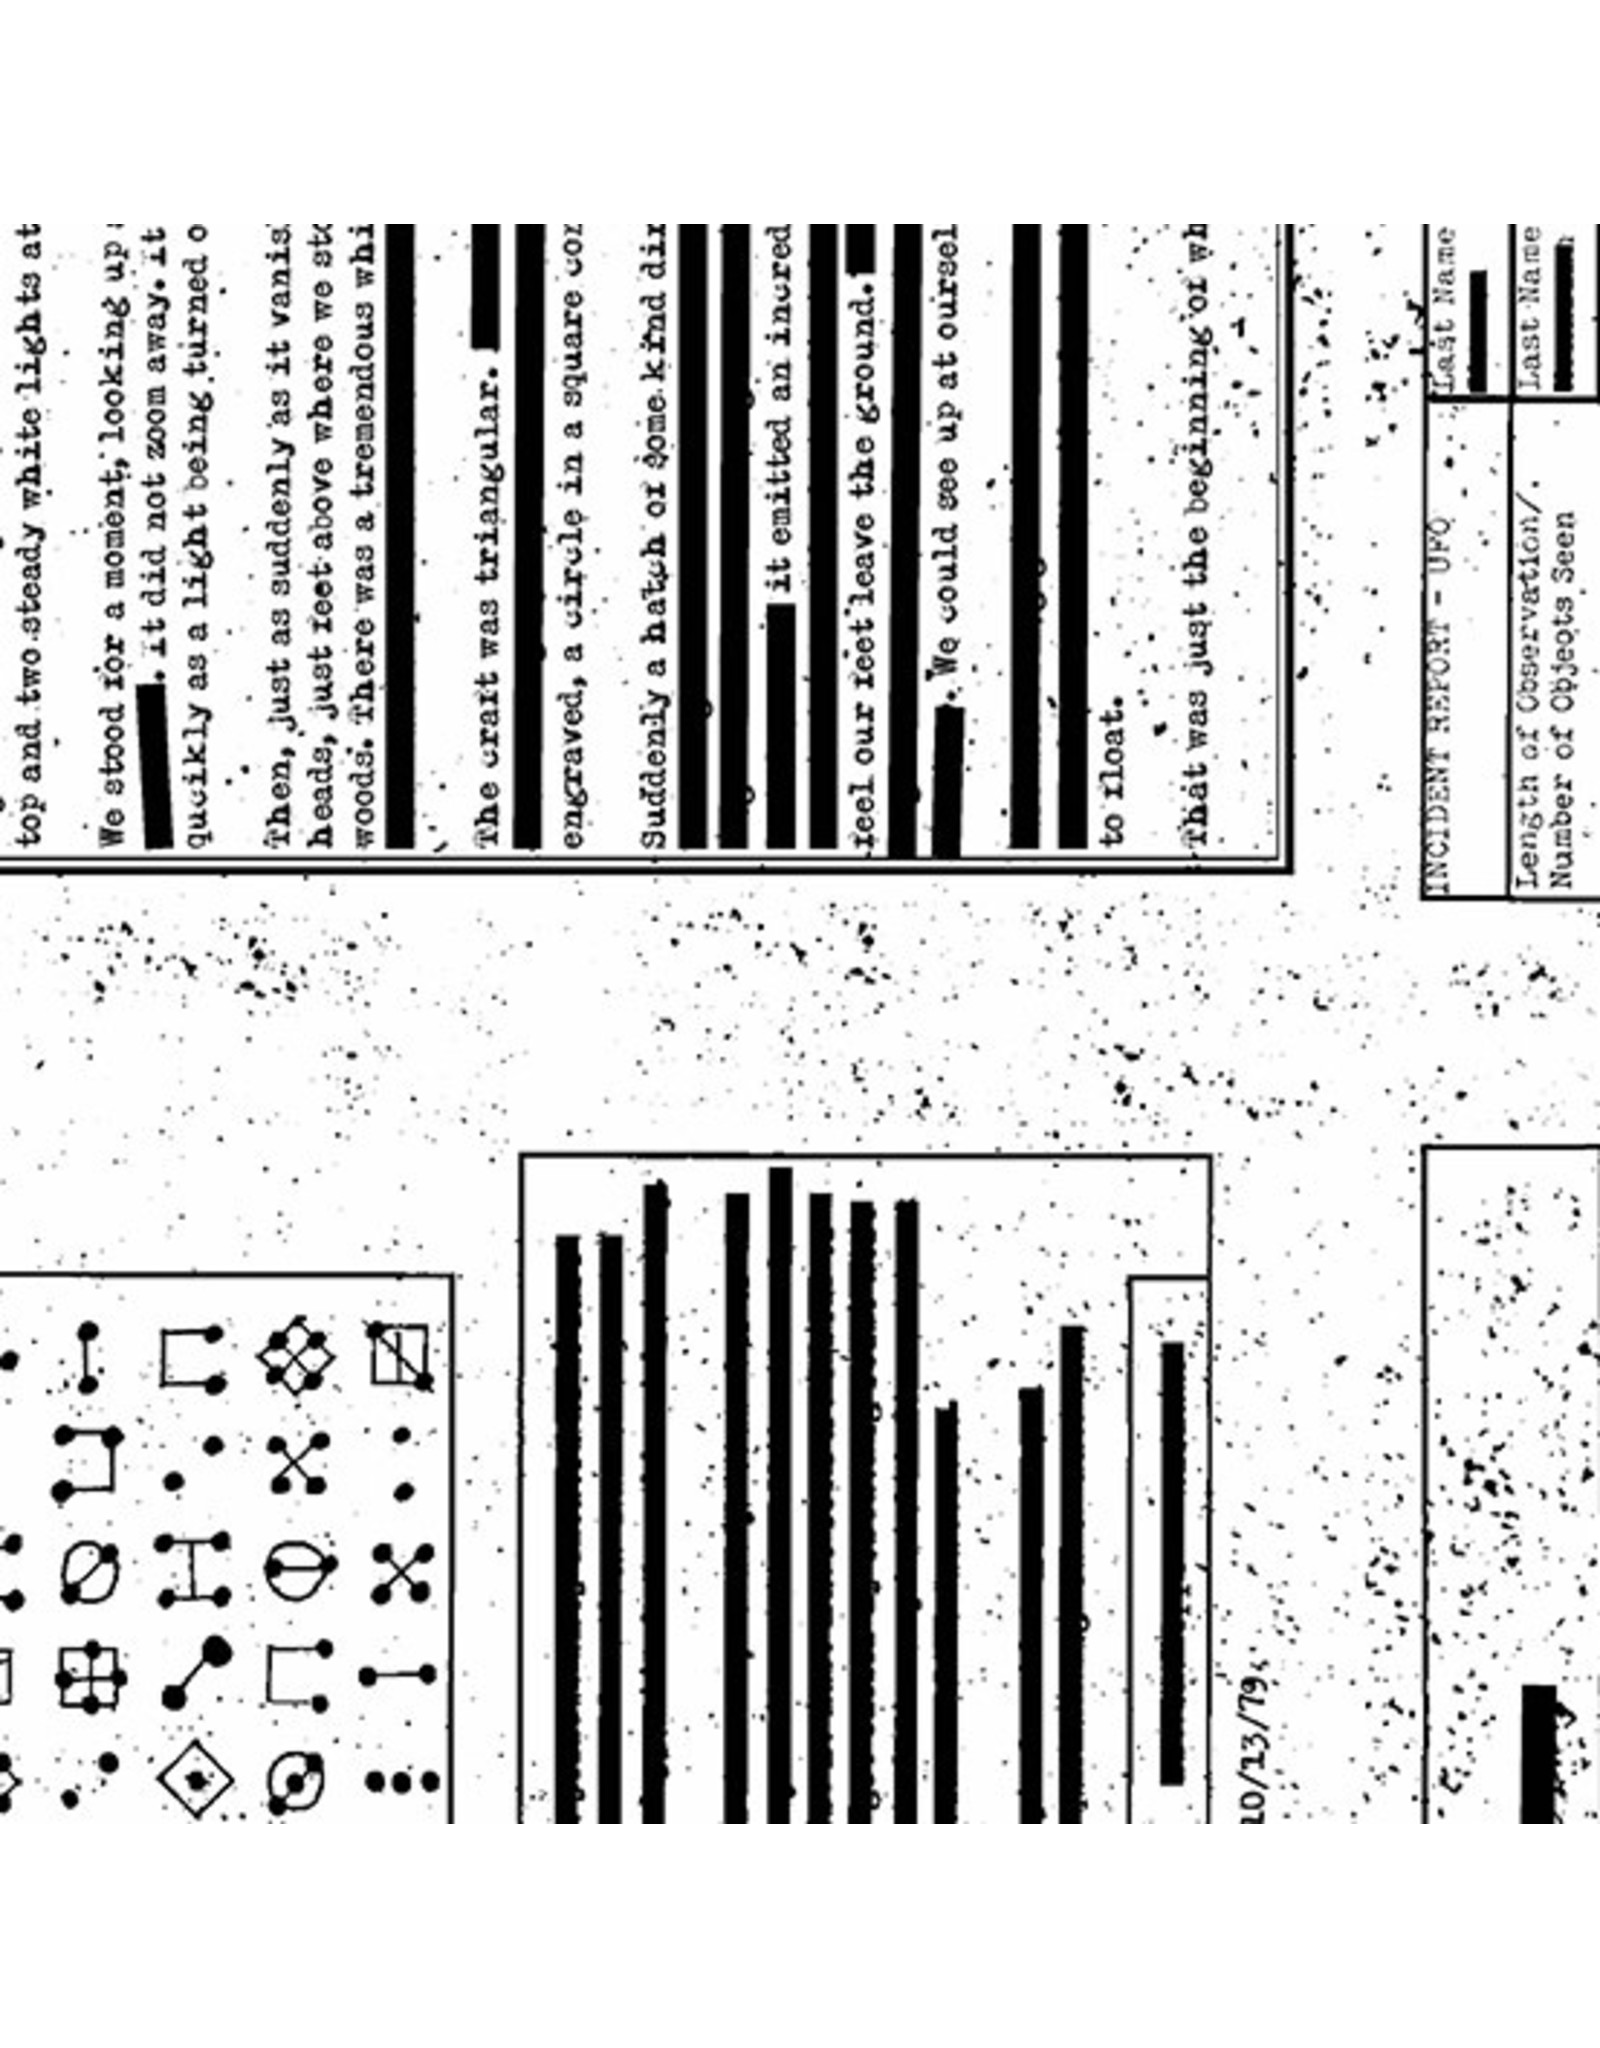 Andover Declassified - Redacted Achromic